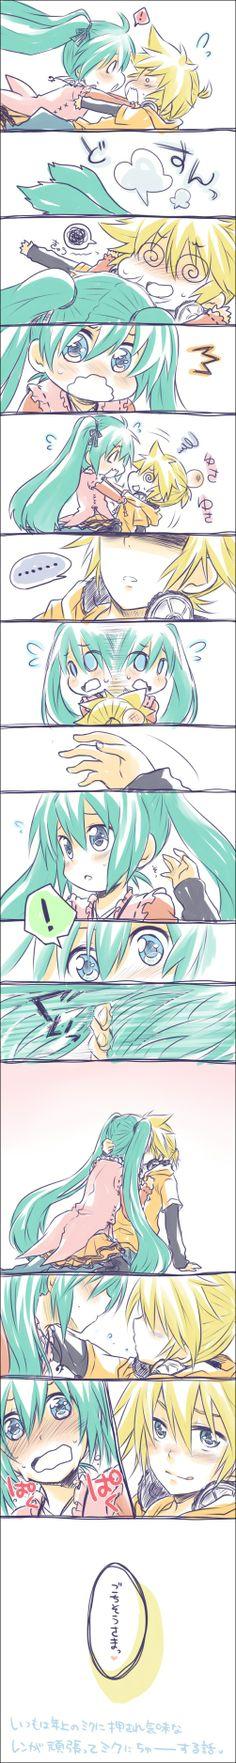 Vokaloid - Len x Miku - Comic